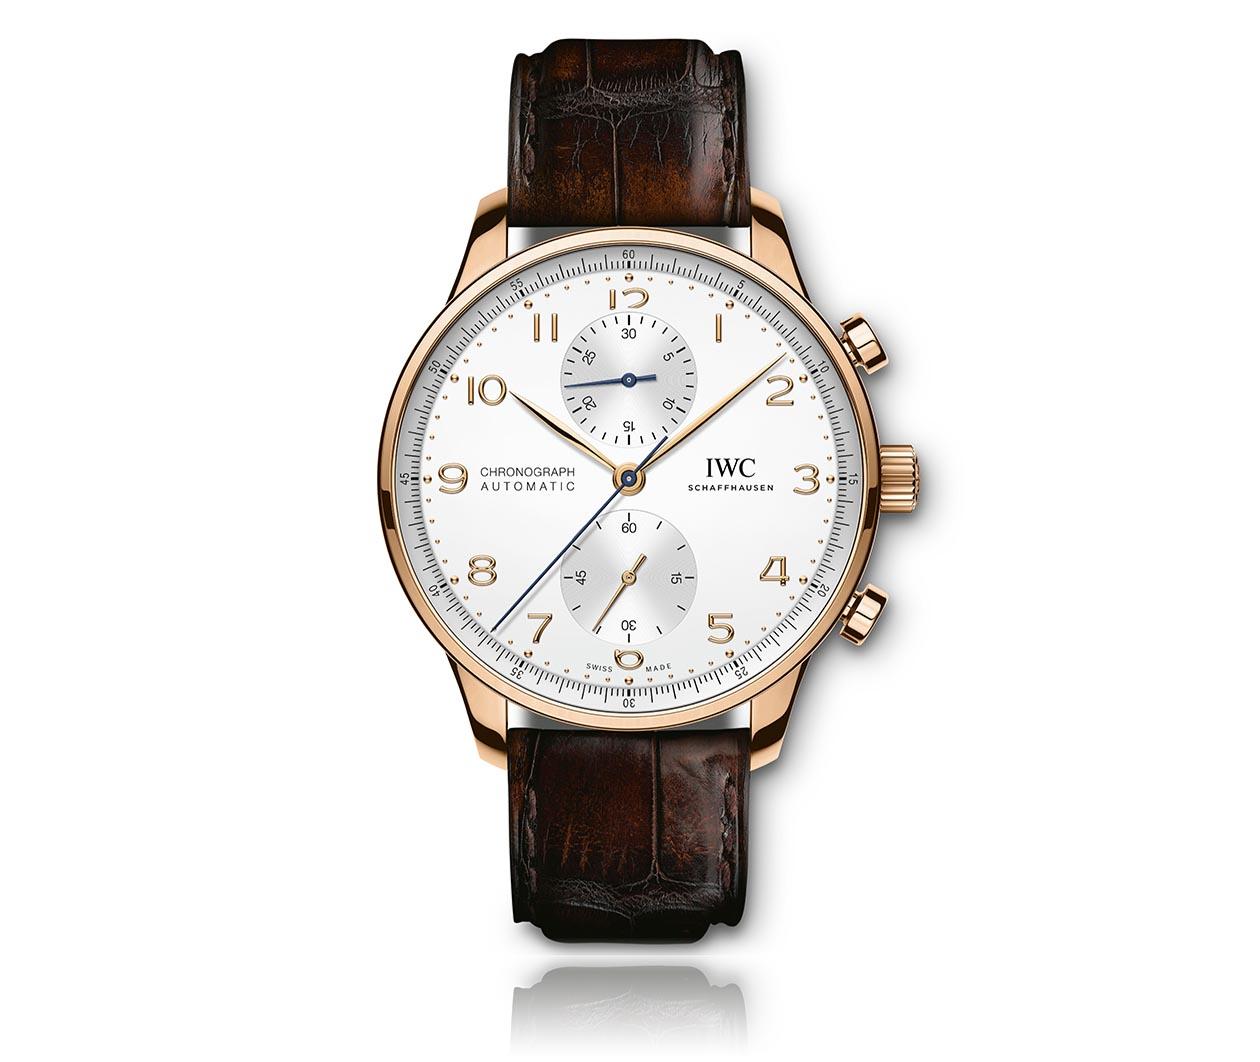 IWC Portugieser Chronograph IW371611 Carousel 1 FINAL